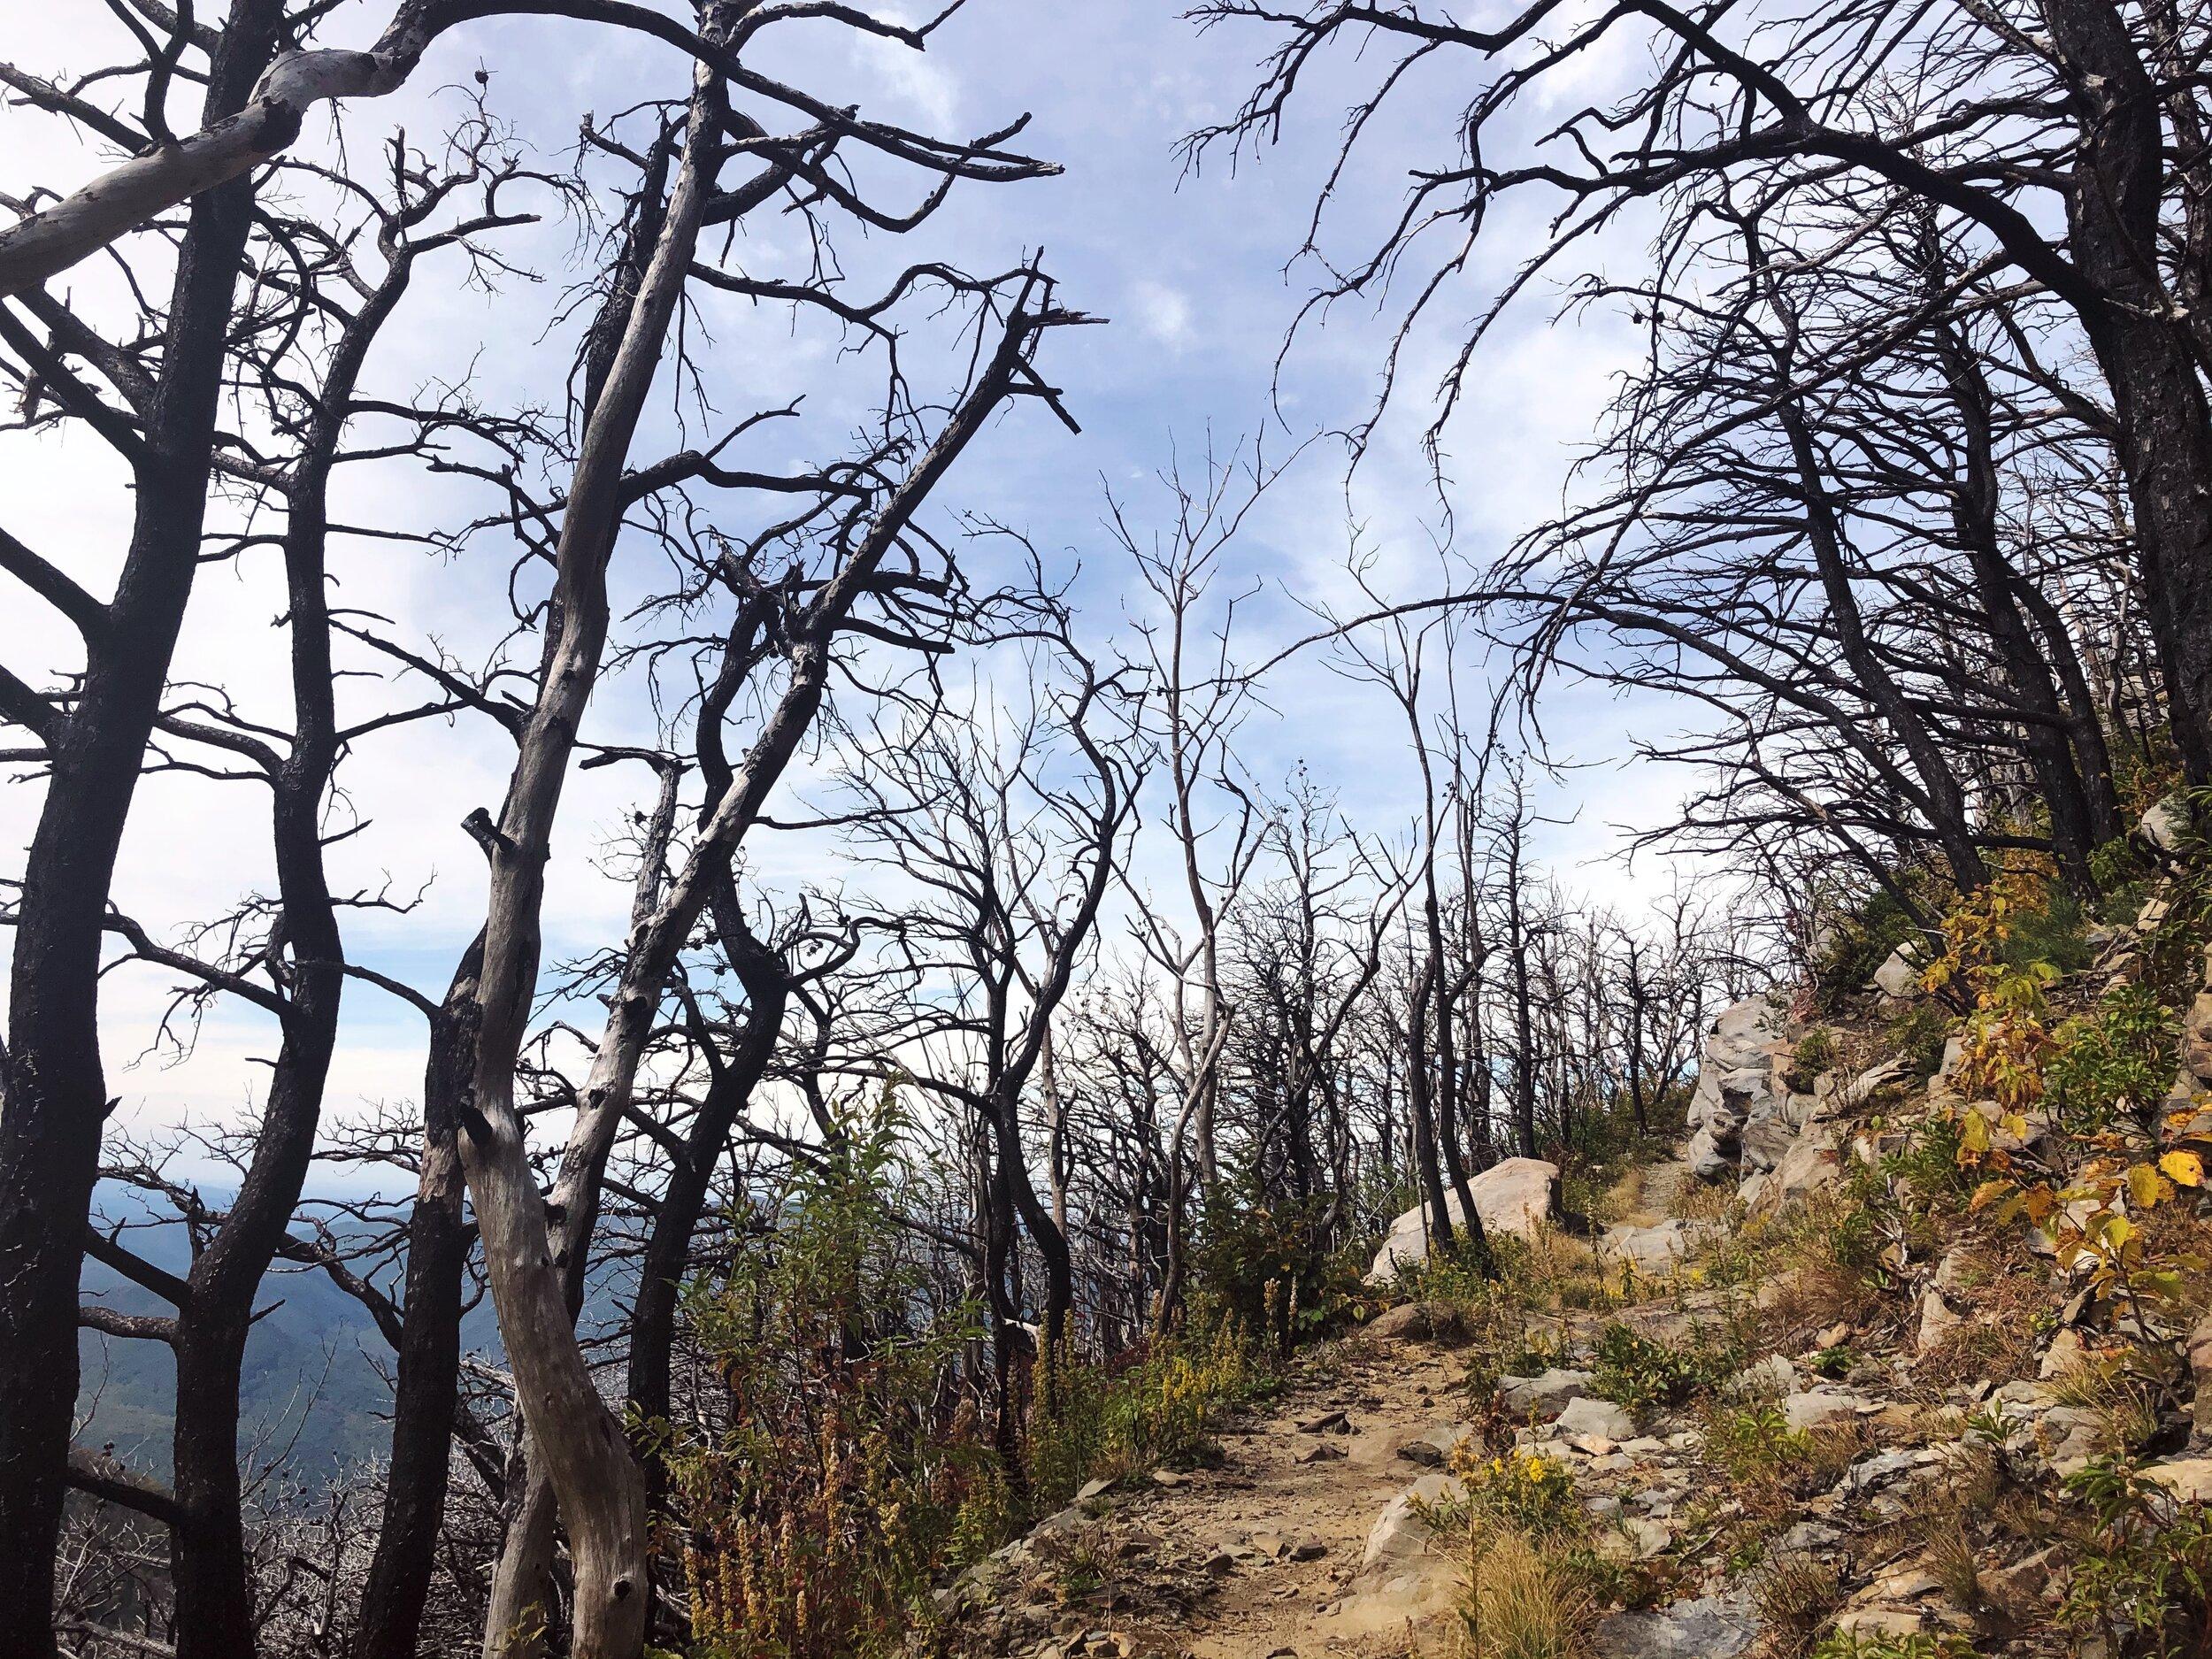 mount-leconte-rainbow falls trail-great-smoky-mountains-gatlinberg-tennessee0445.JPG